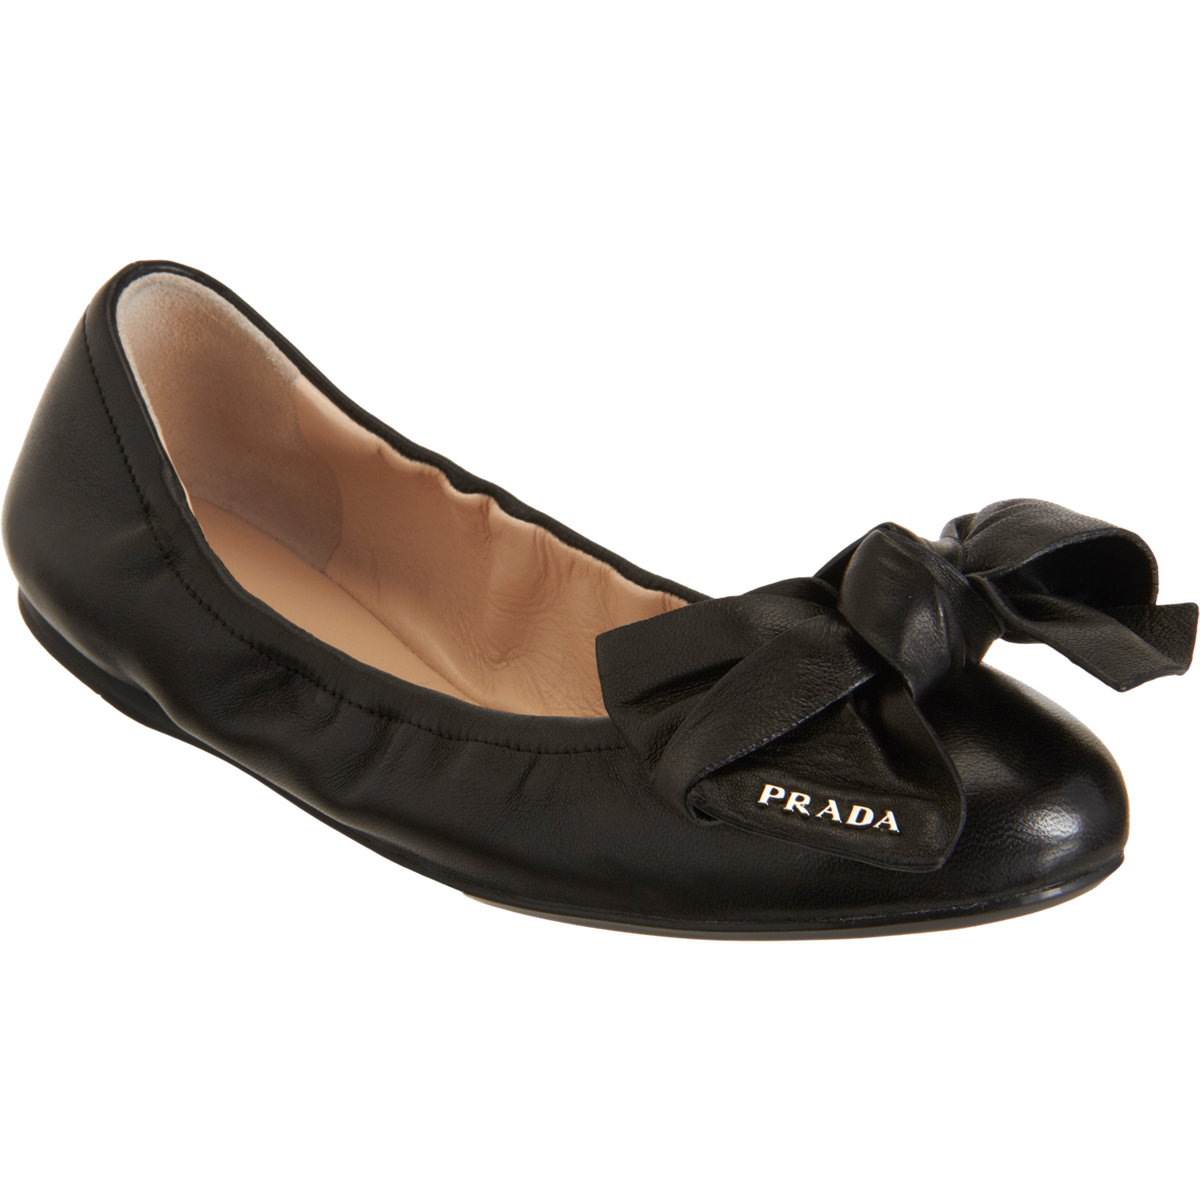 Barneys Prada Womens Shoes